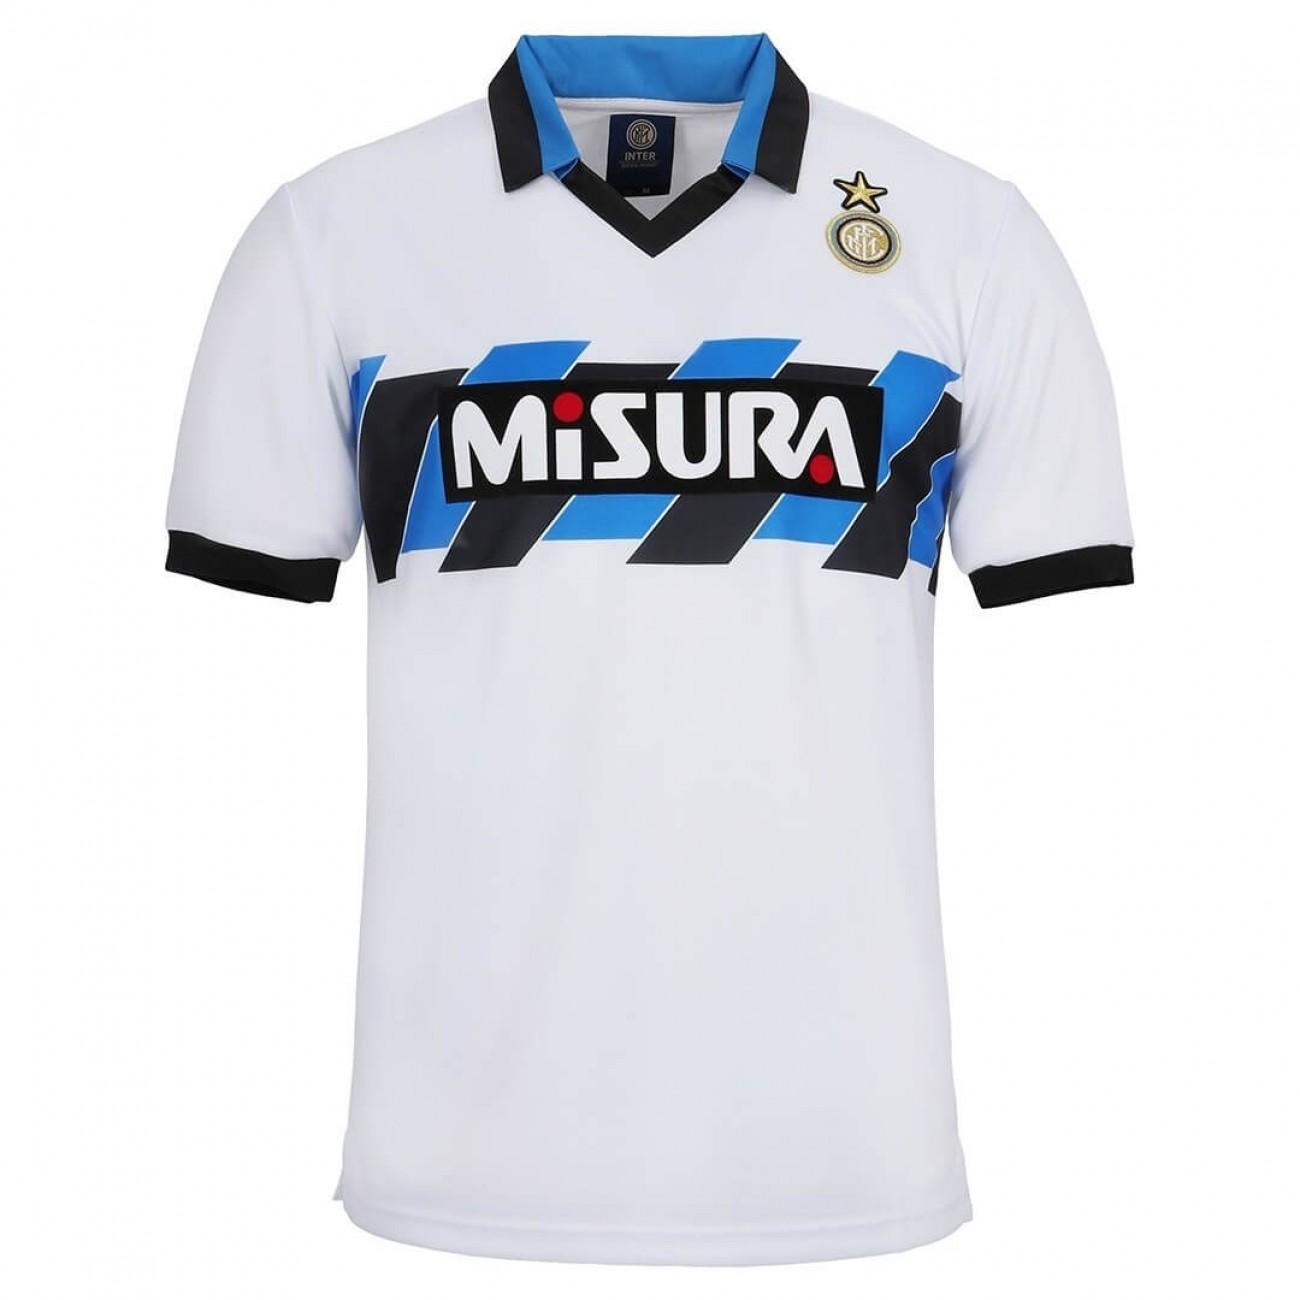 Retrofootball® Inter Maglia Storica Bianca 1991 cfW1pB1